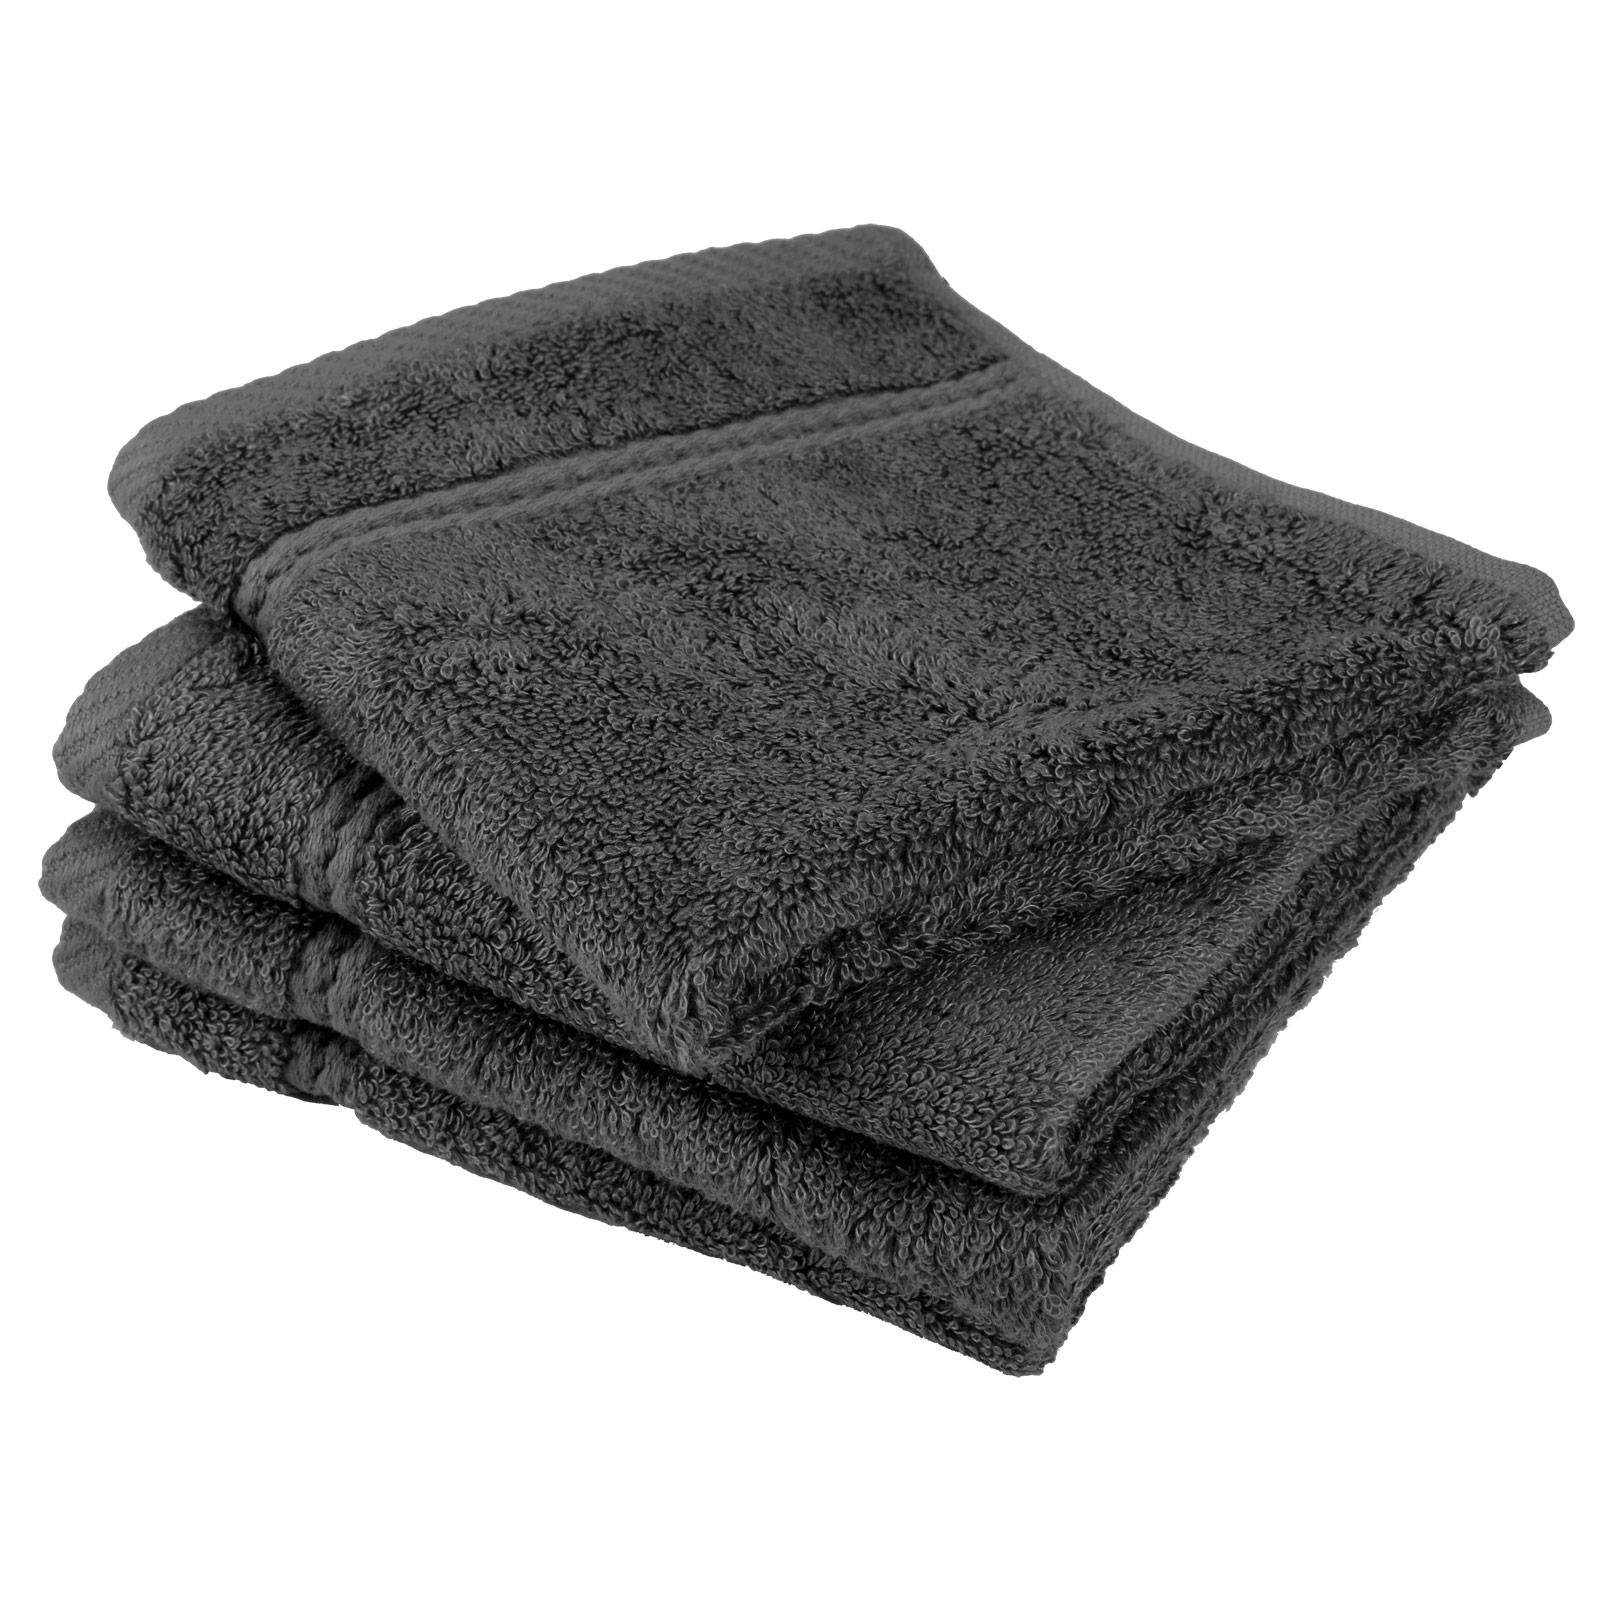 Slate Grey Bathroom Cabinets: Slate Grey Bamboo Bathroom Bath Linen Soft Face Cloth